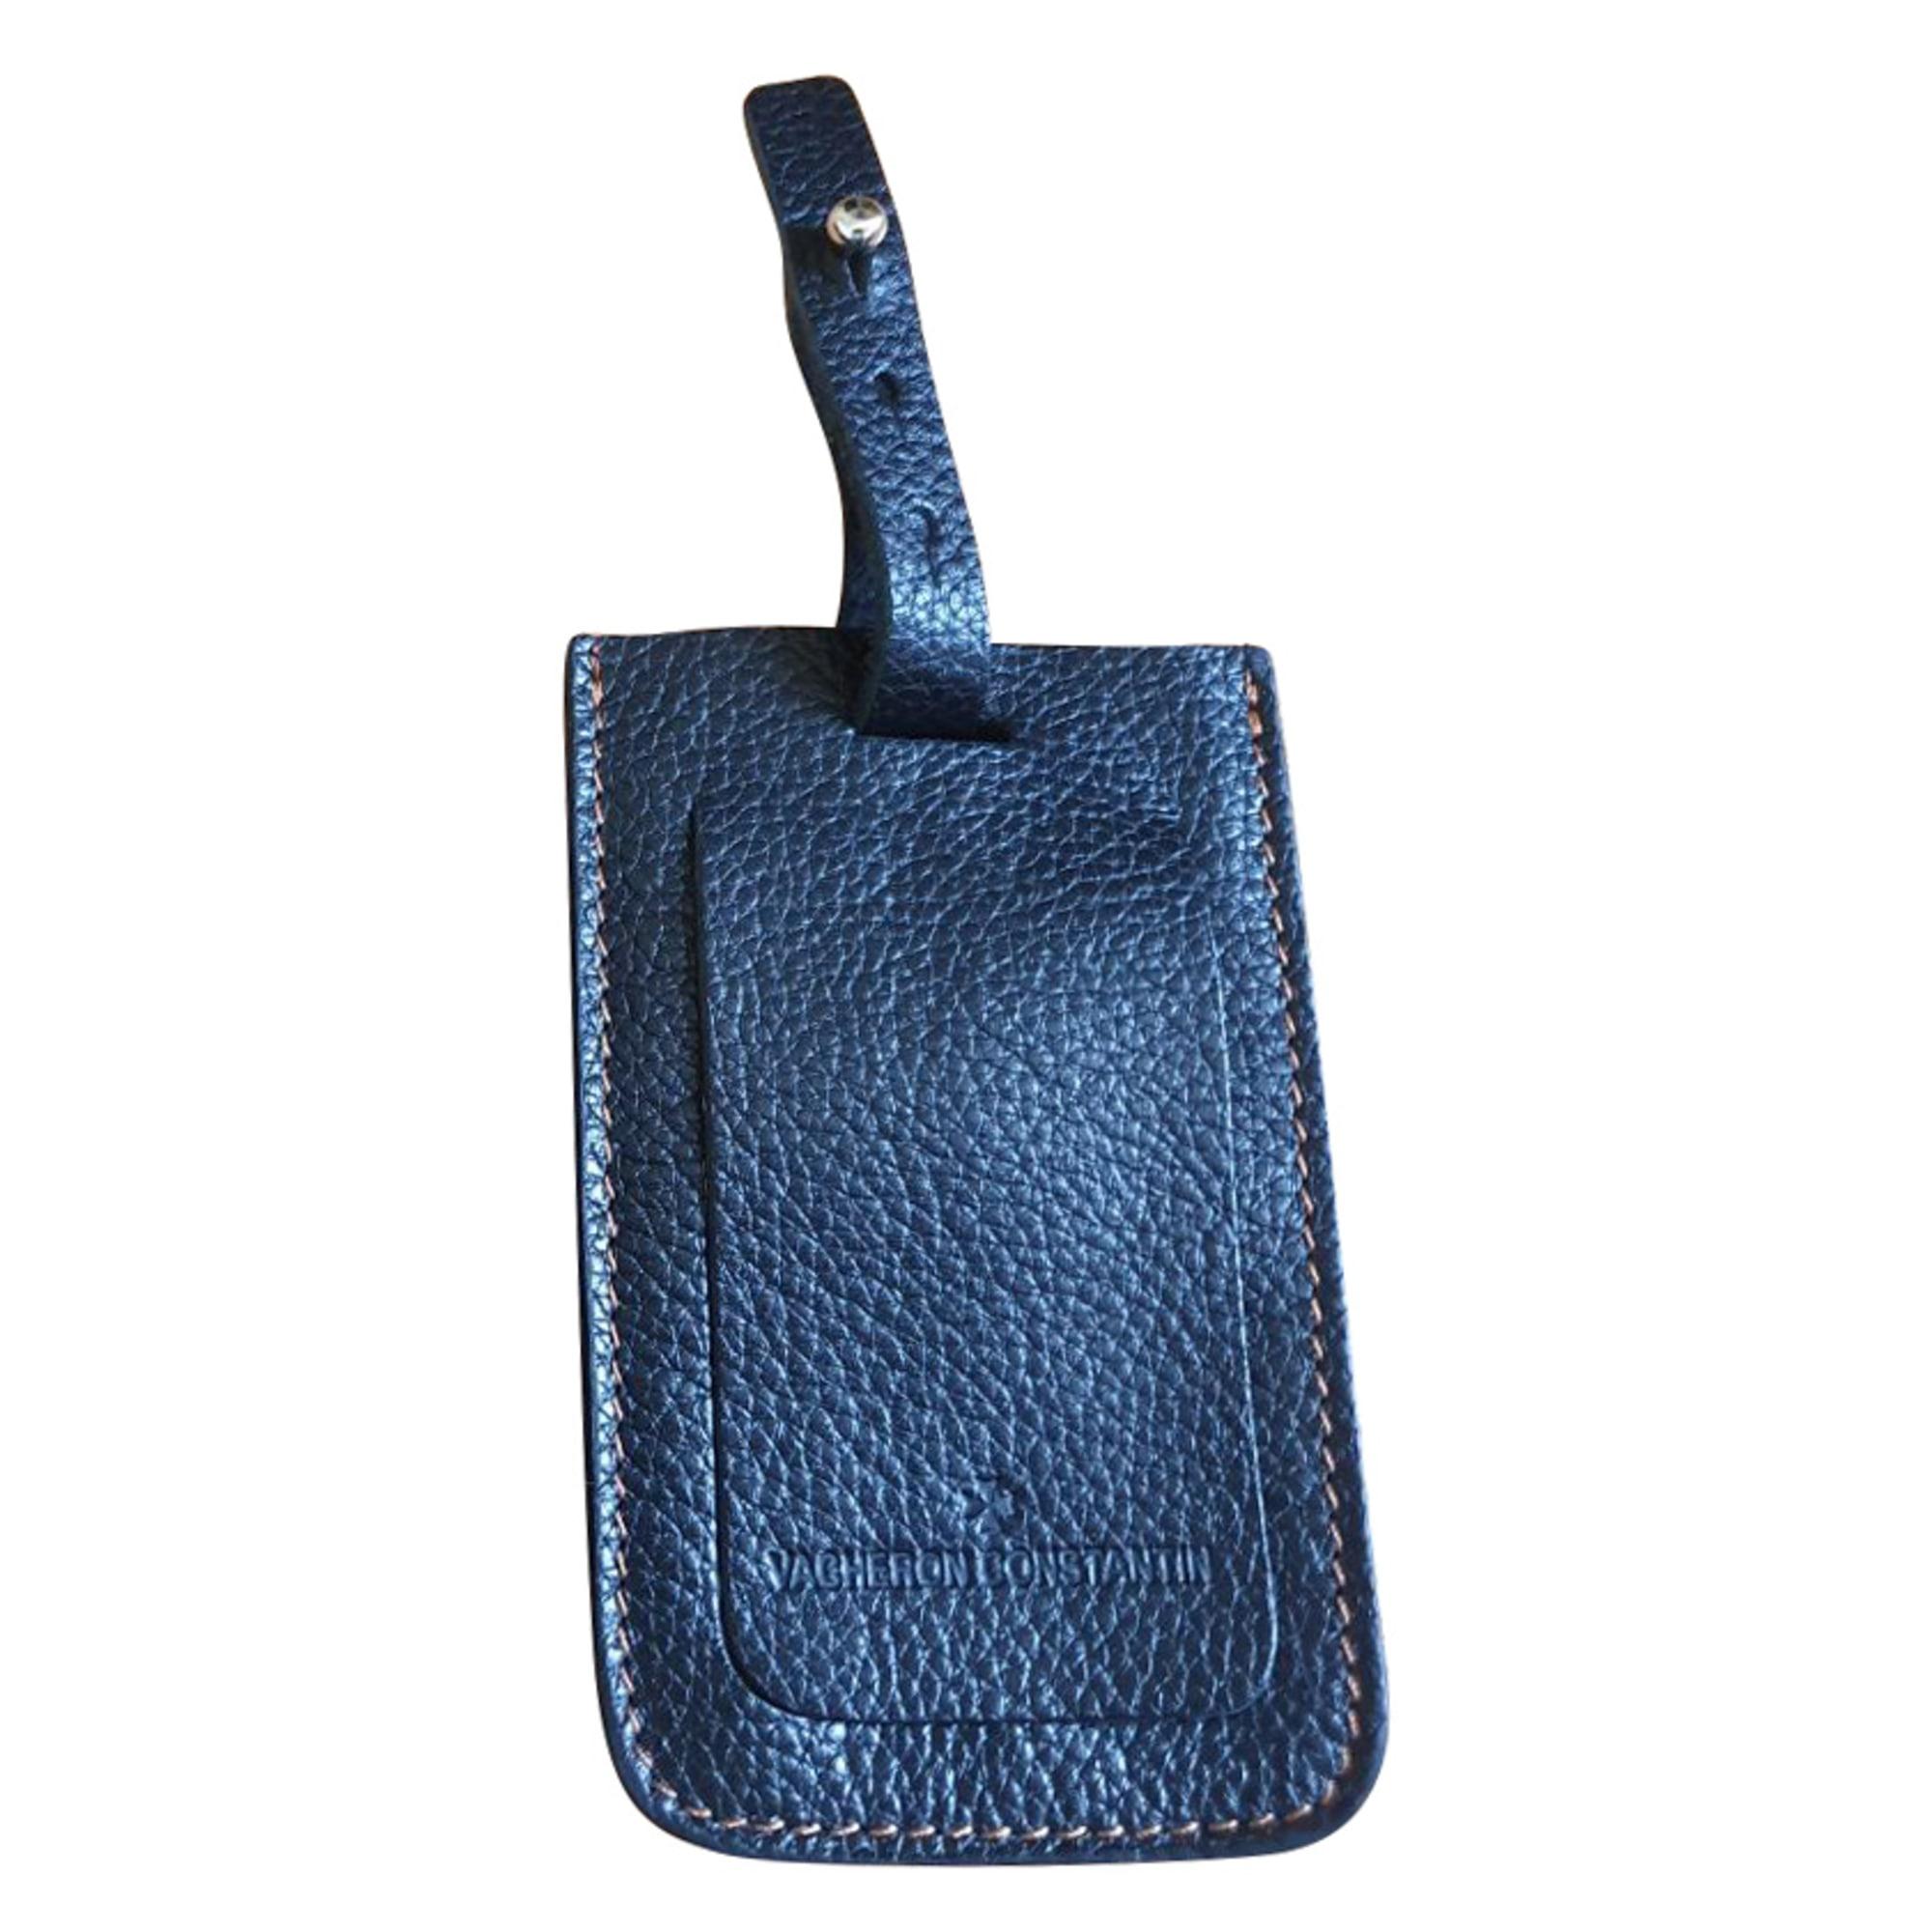 Porte-clés VACHERON CONSTANTIN Bleu, bleu marine, bleu turquoise